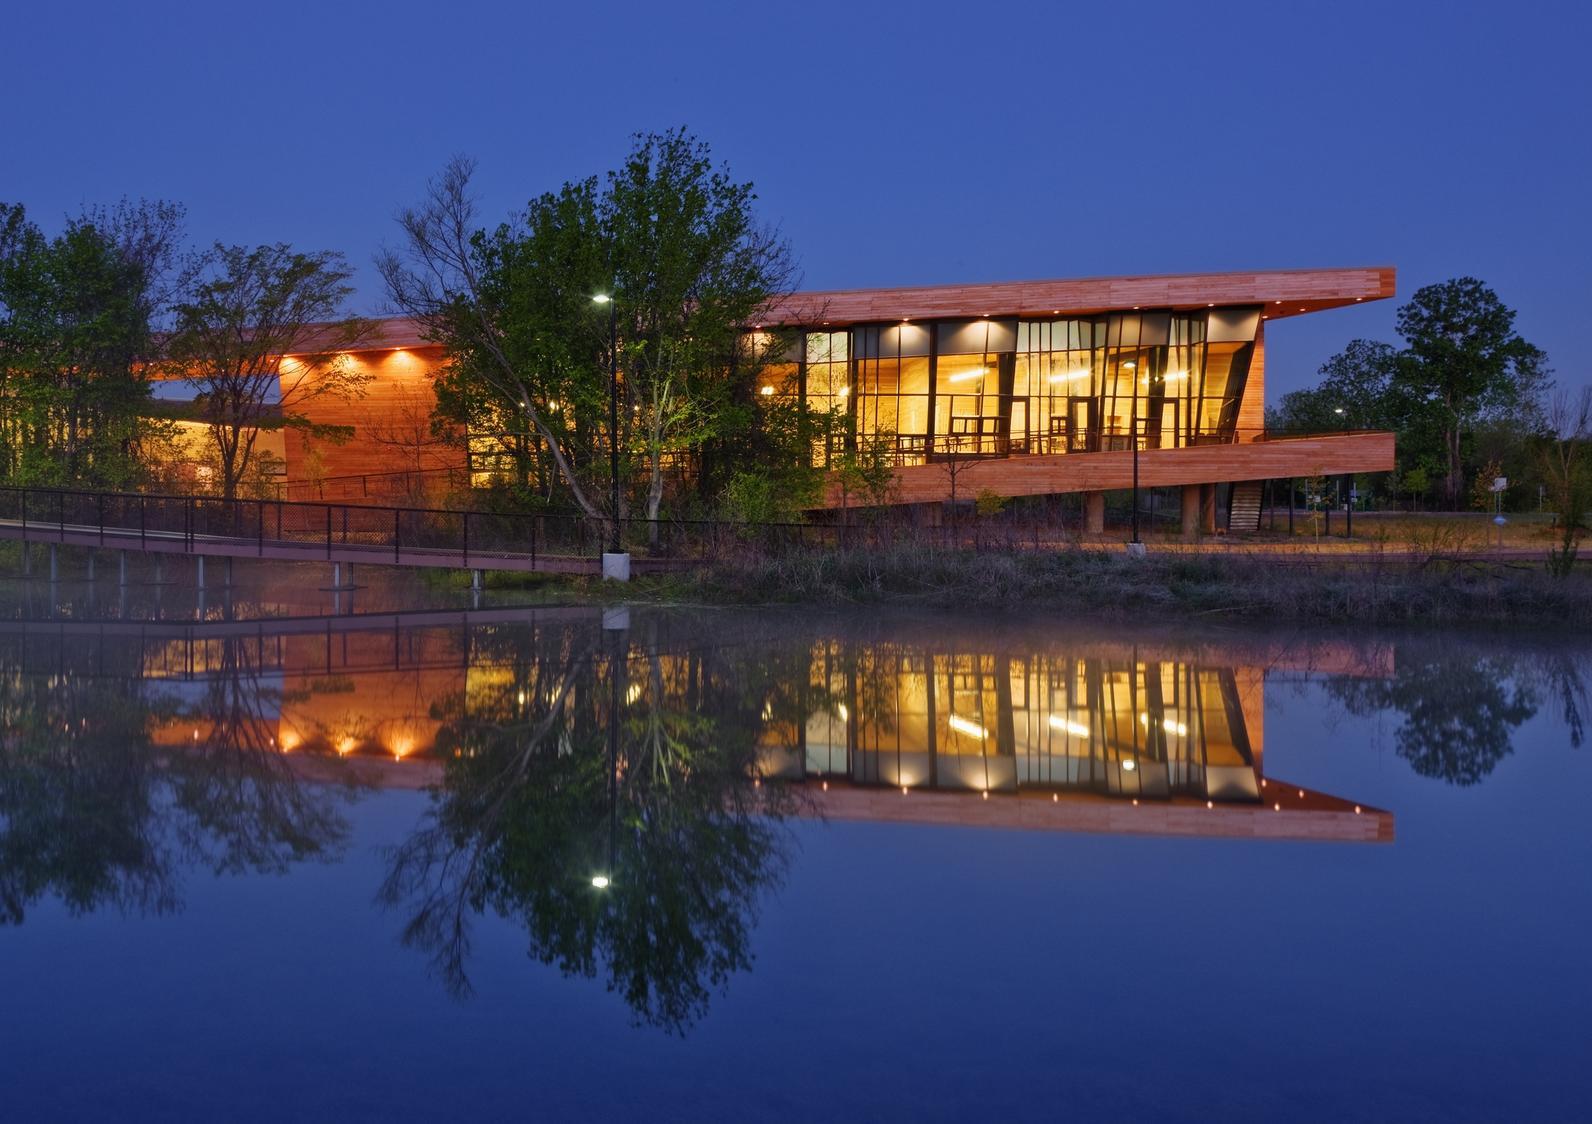 Trinity River Audubon Center | Audubon Texas